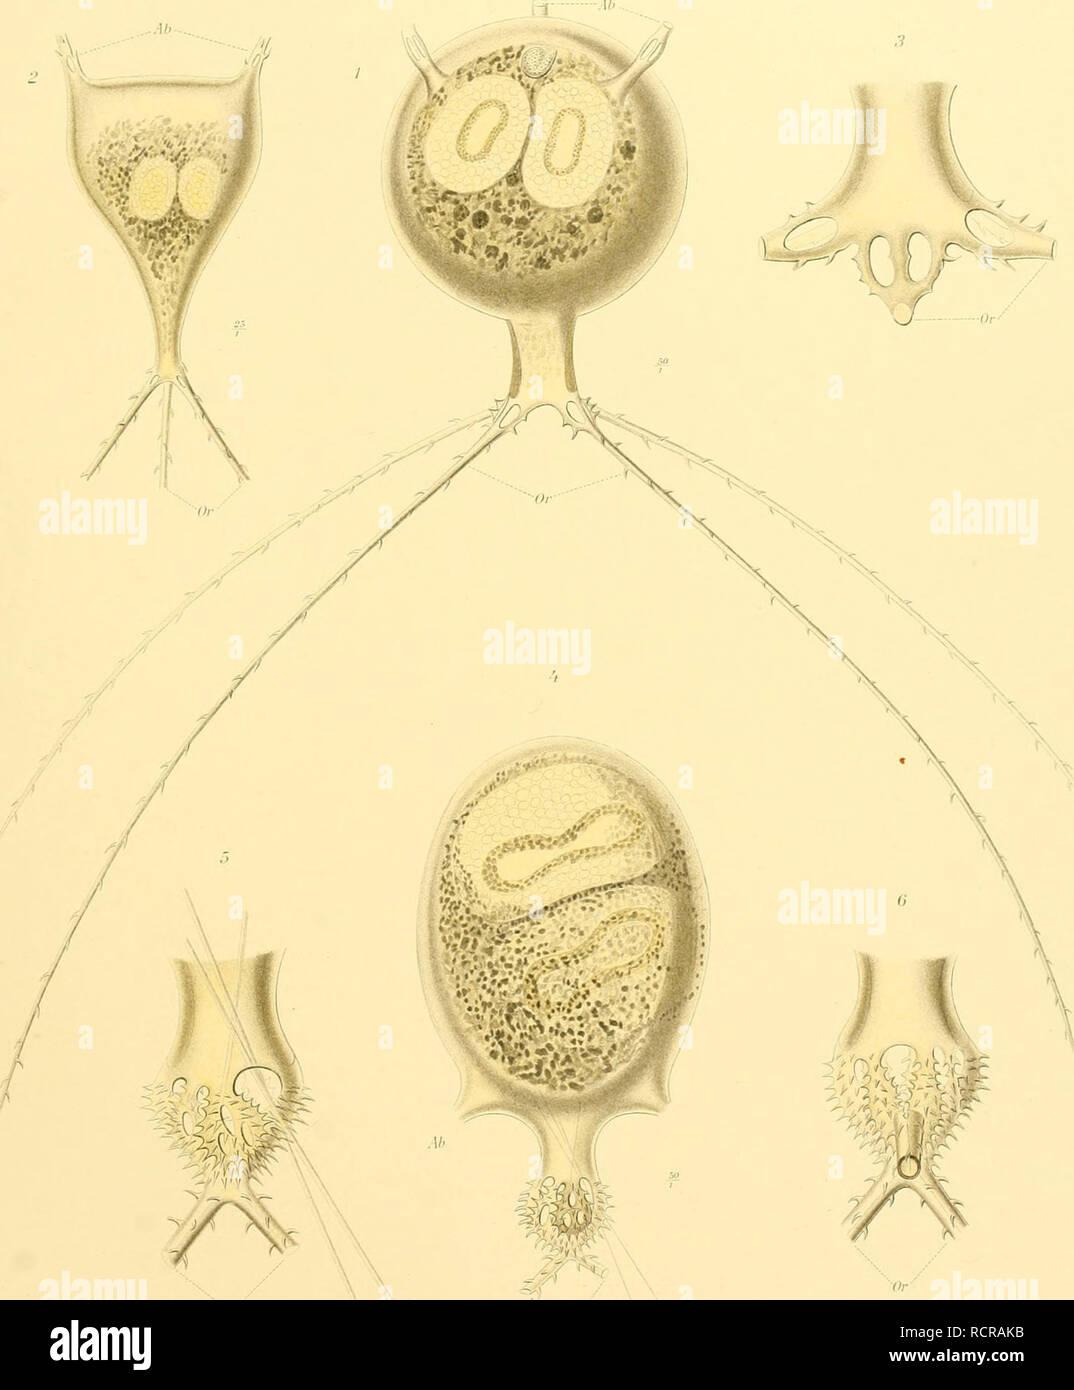 Tua Dua Eettafel.Deutsche Sudpolar Expedition 1901 1903 Im Auftrage Des